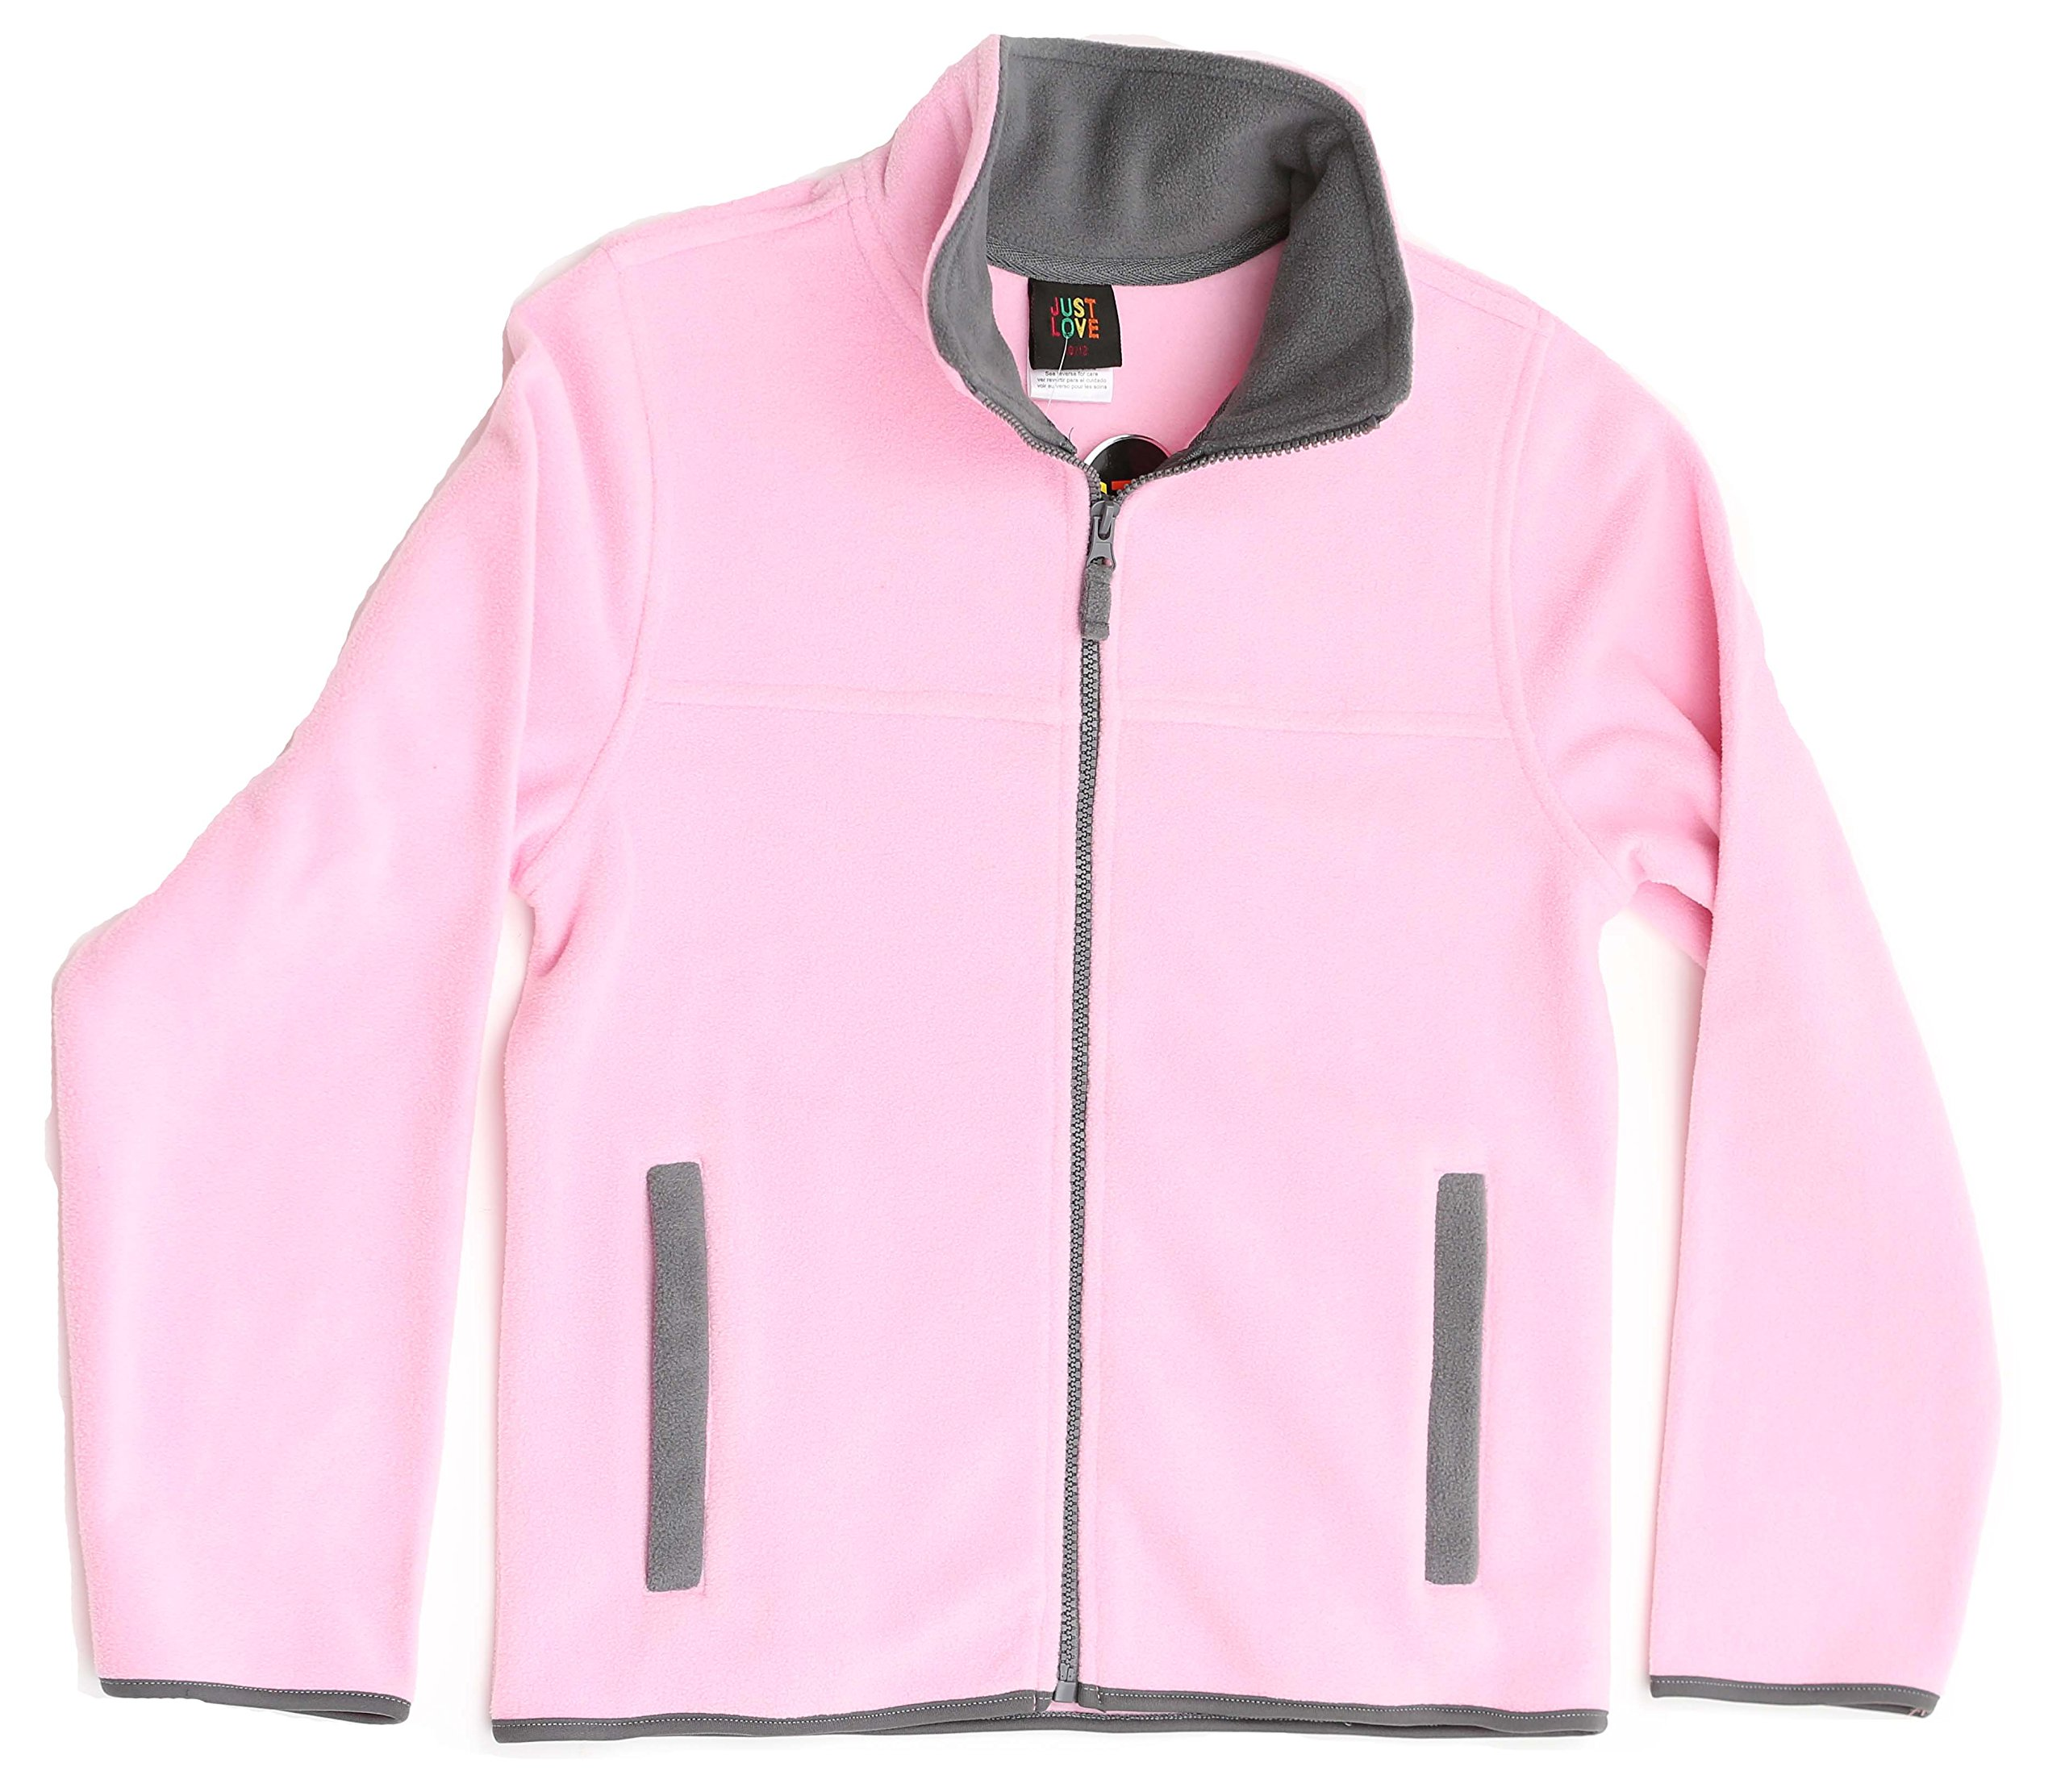 Just Love 98503-PNK-4-5 Solid Polar Fleece Girls Jacket